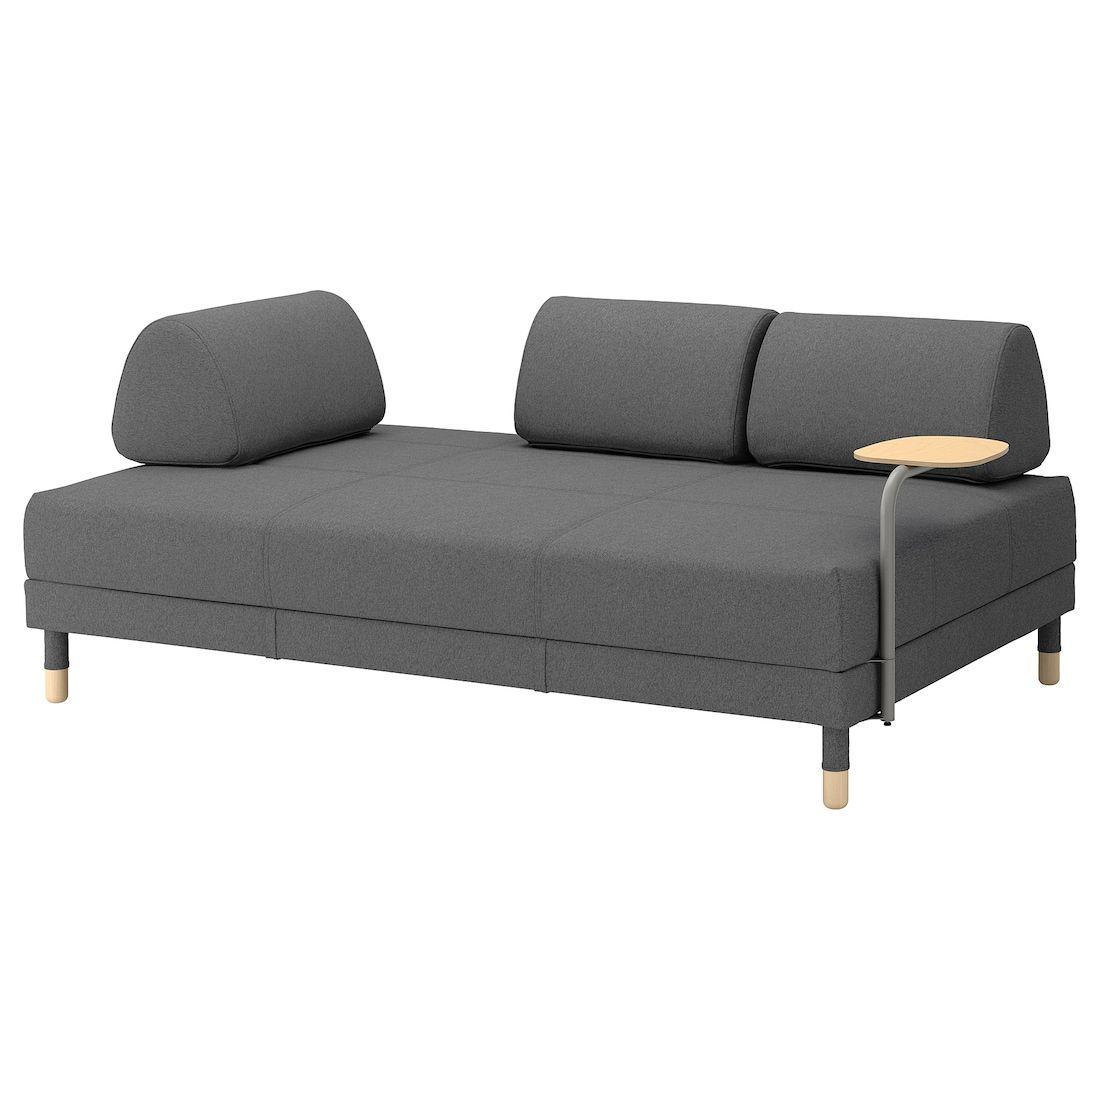 Ikea Us Furniture And Home Furnishings Sleeper Sofa Sofa Bed Frame Sofa